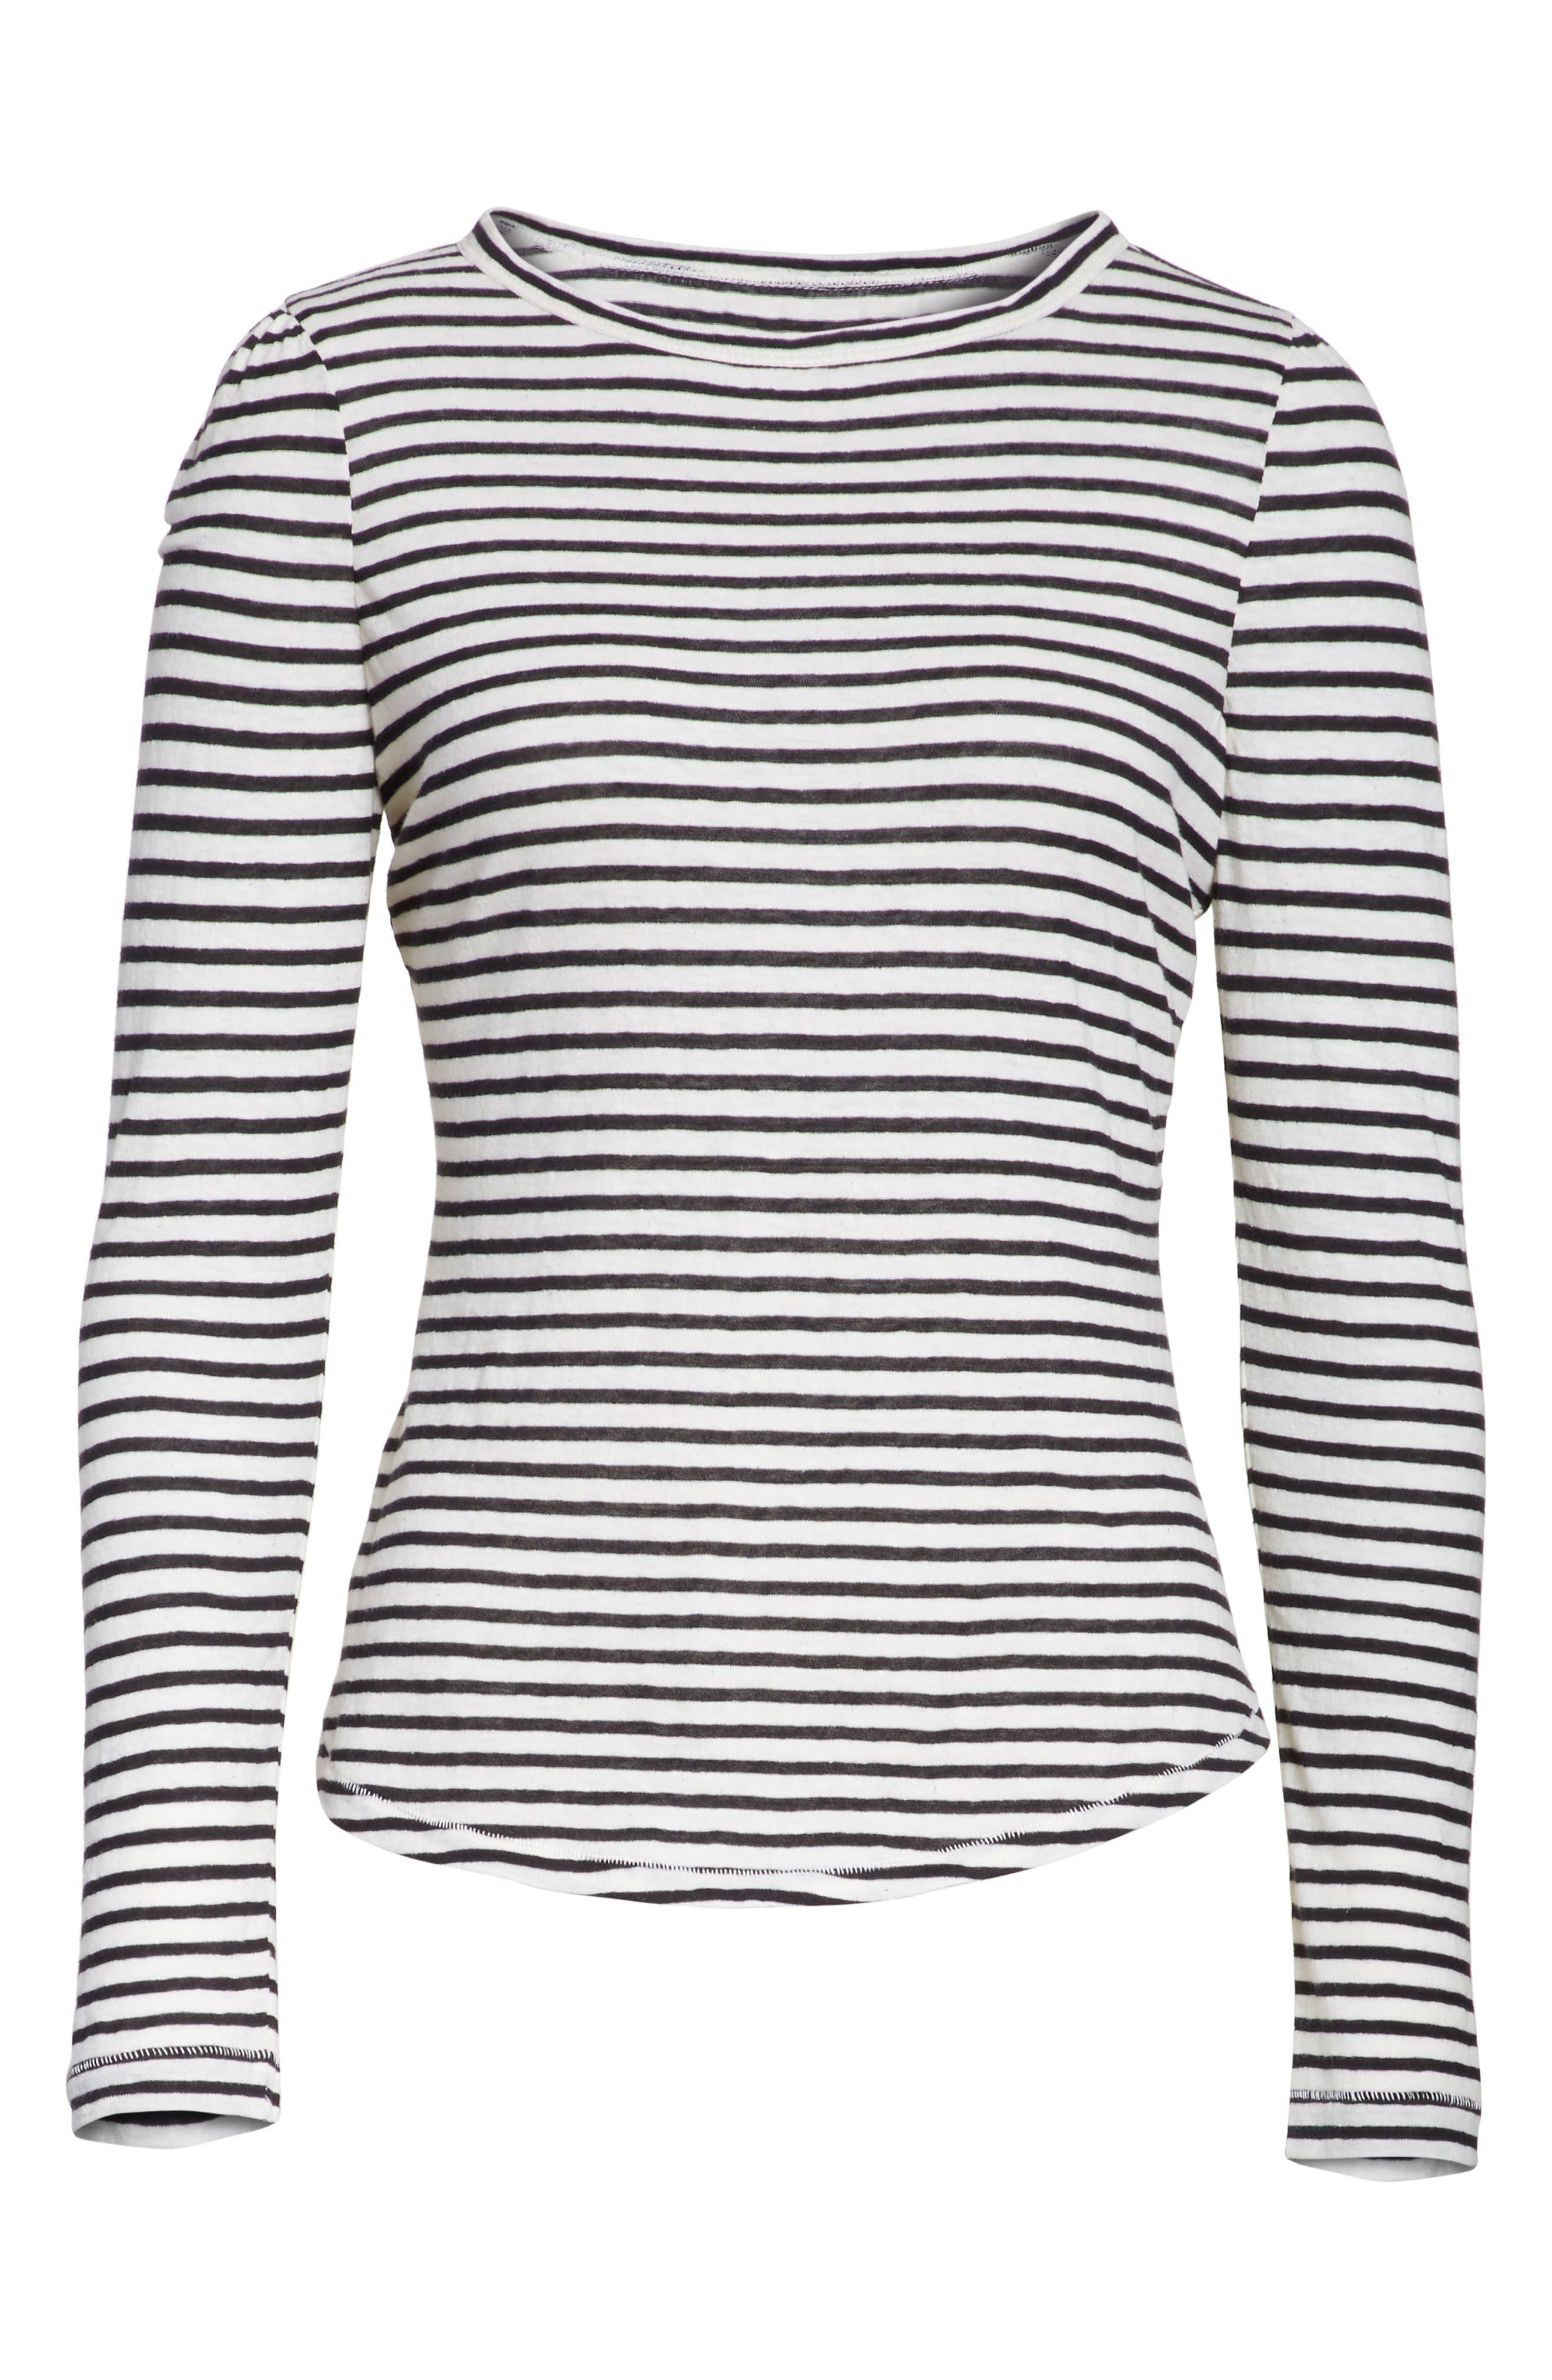 Long Sleeve Stripe Tee,                             Alternate thumbnail 6, color,                             904